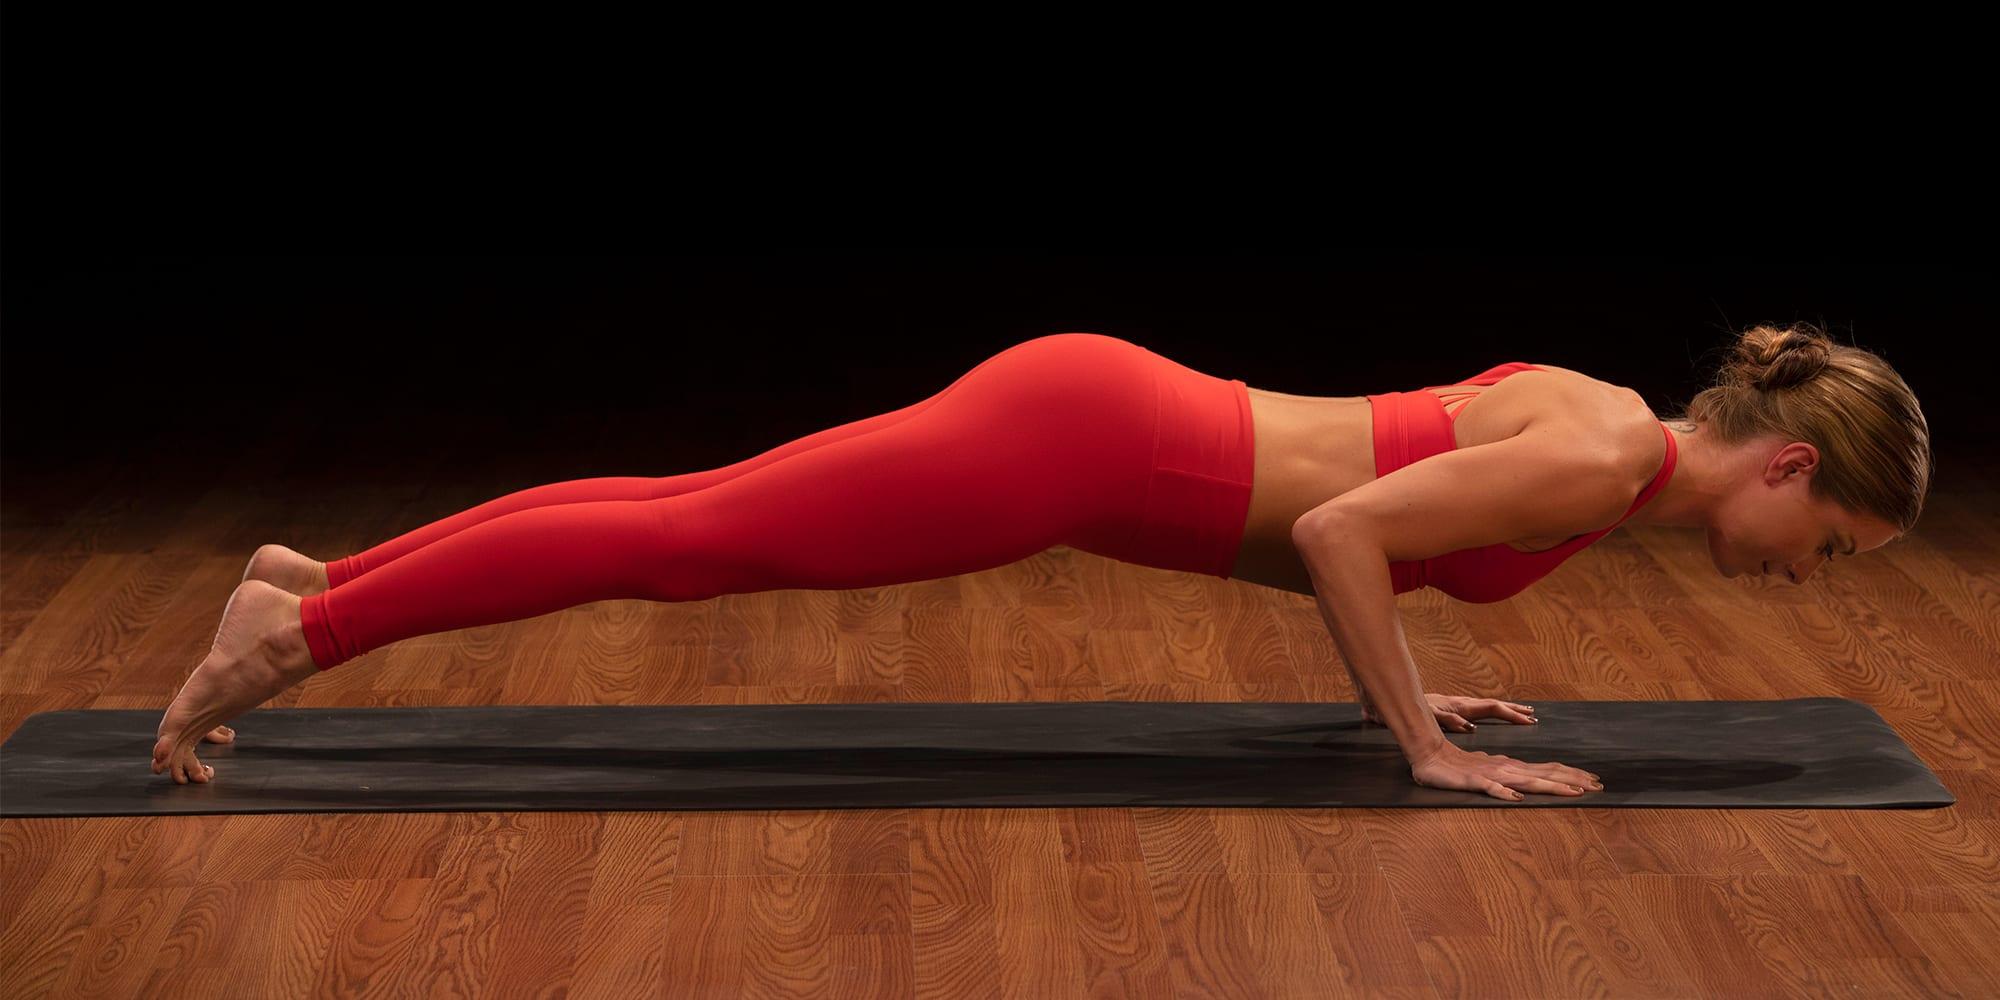 How to Do Chaturanga Dandasana Yoga Pose With Perfect Form